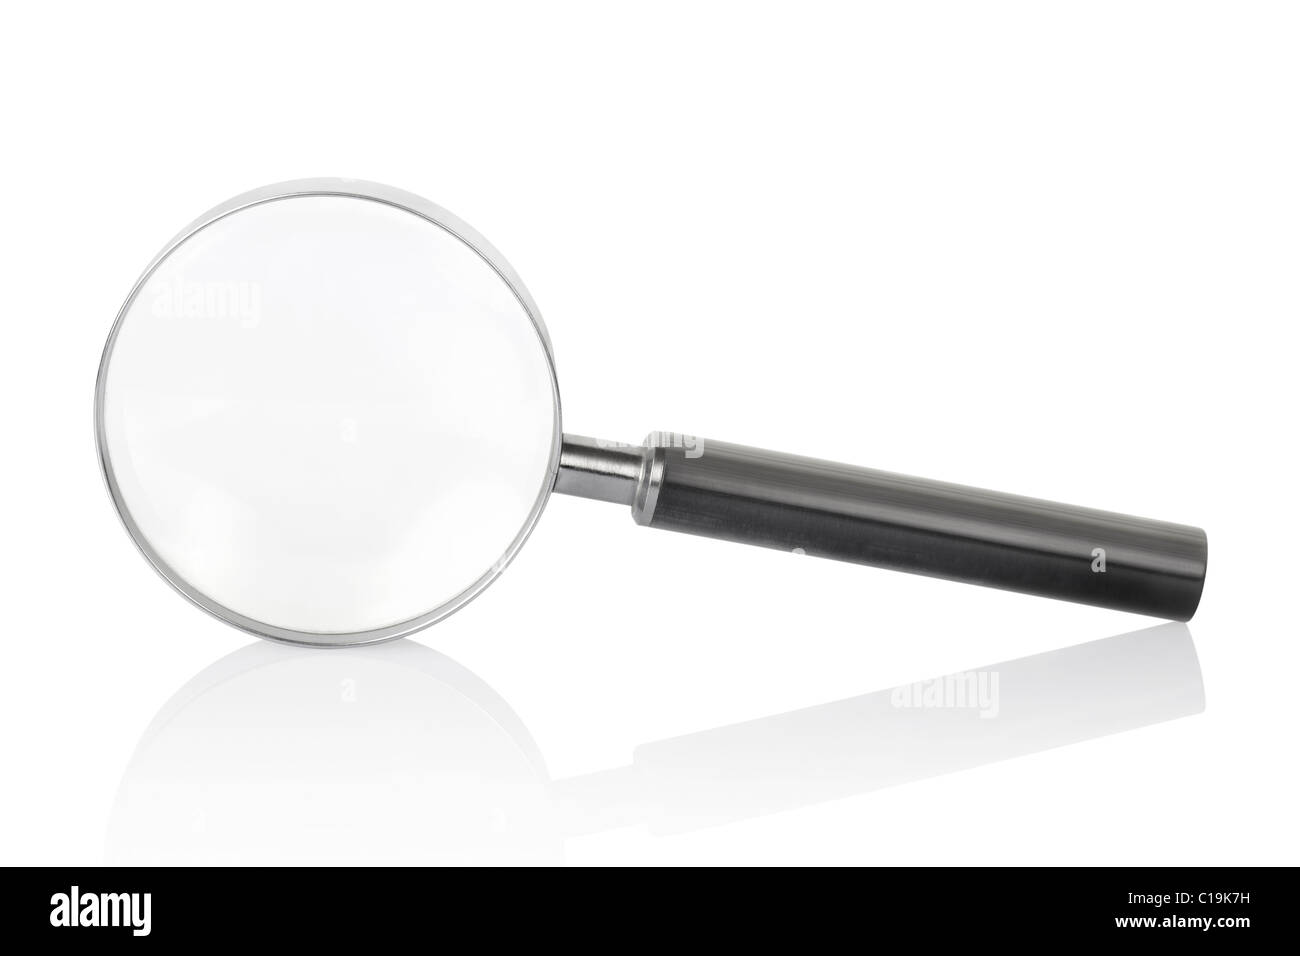 Lupa aislado sobre fondo blanco. Imagen De Stock